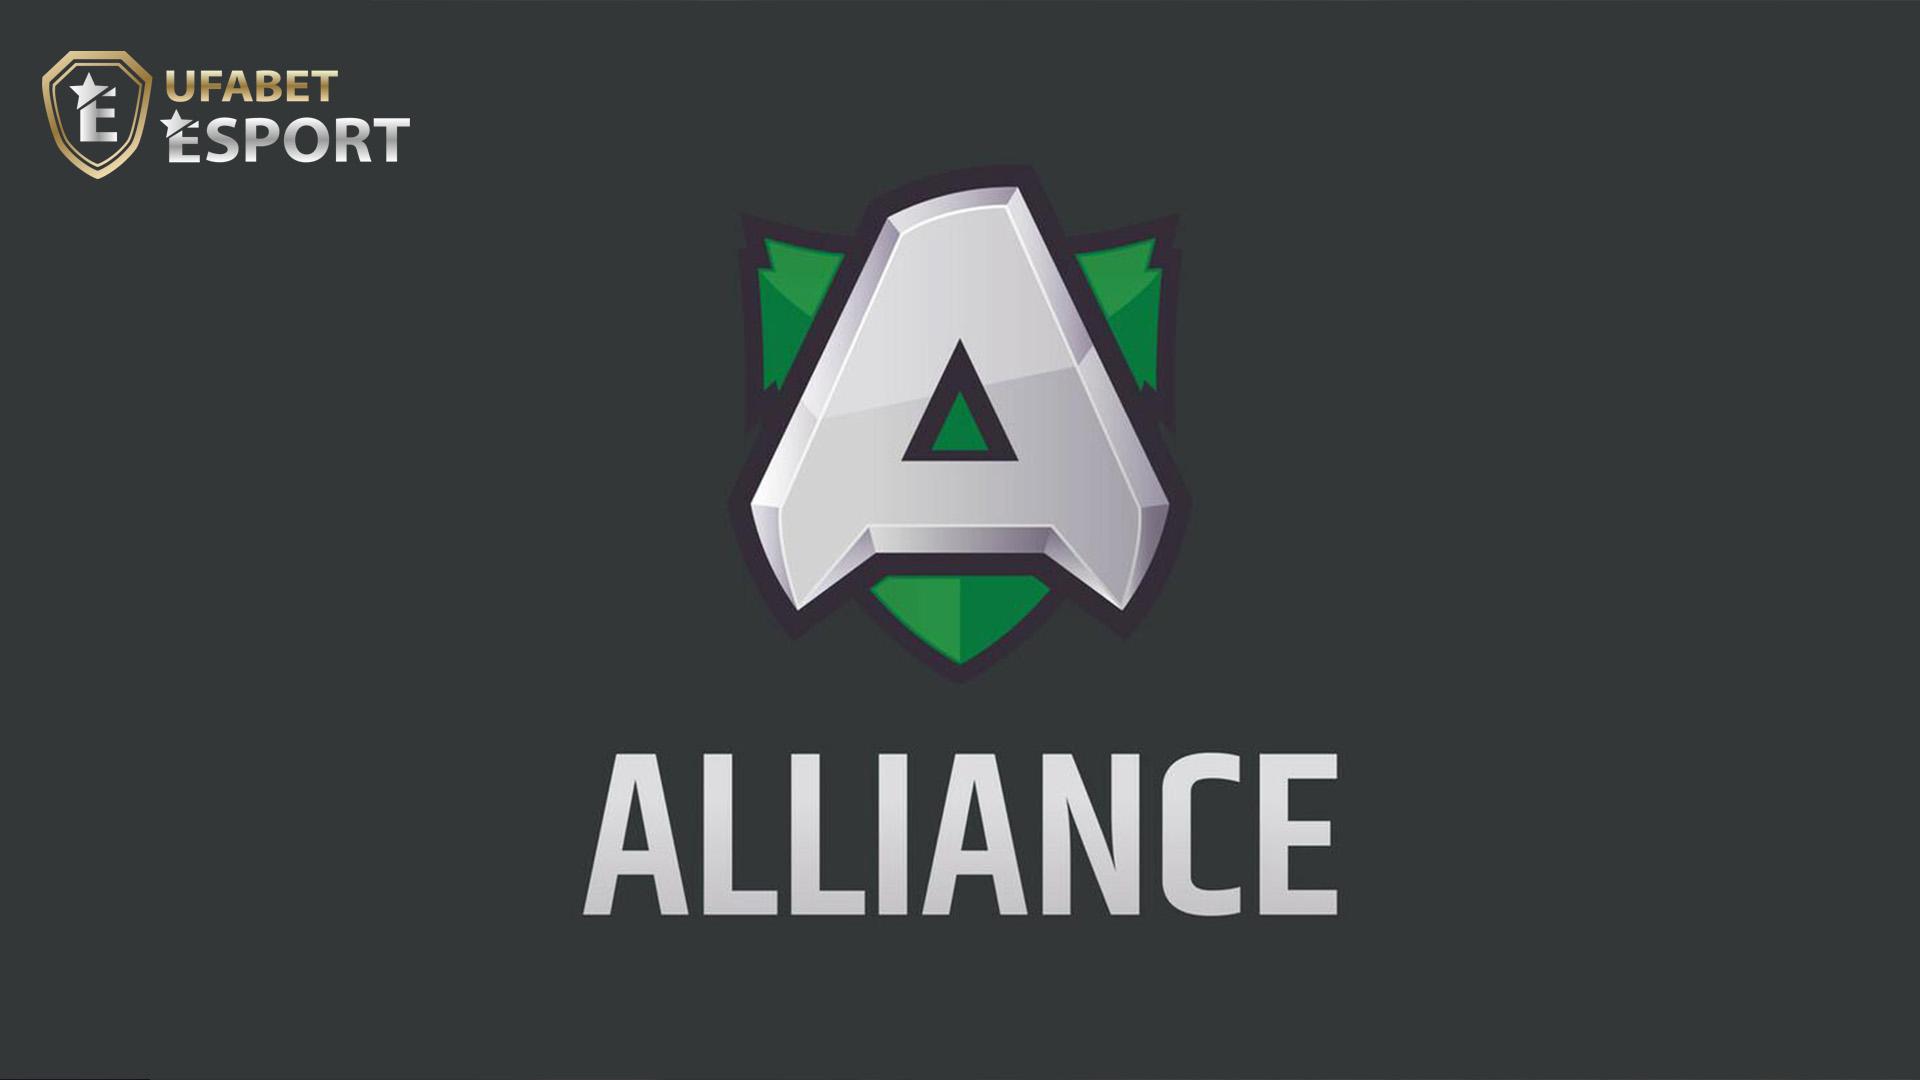 Team Alliance